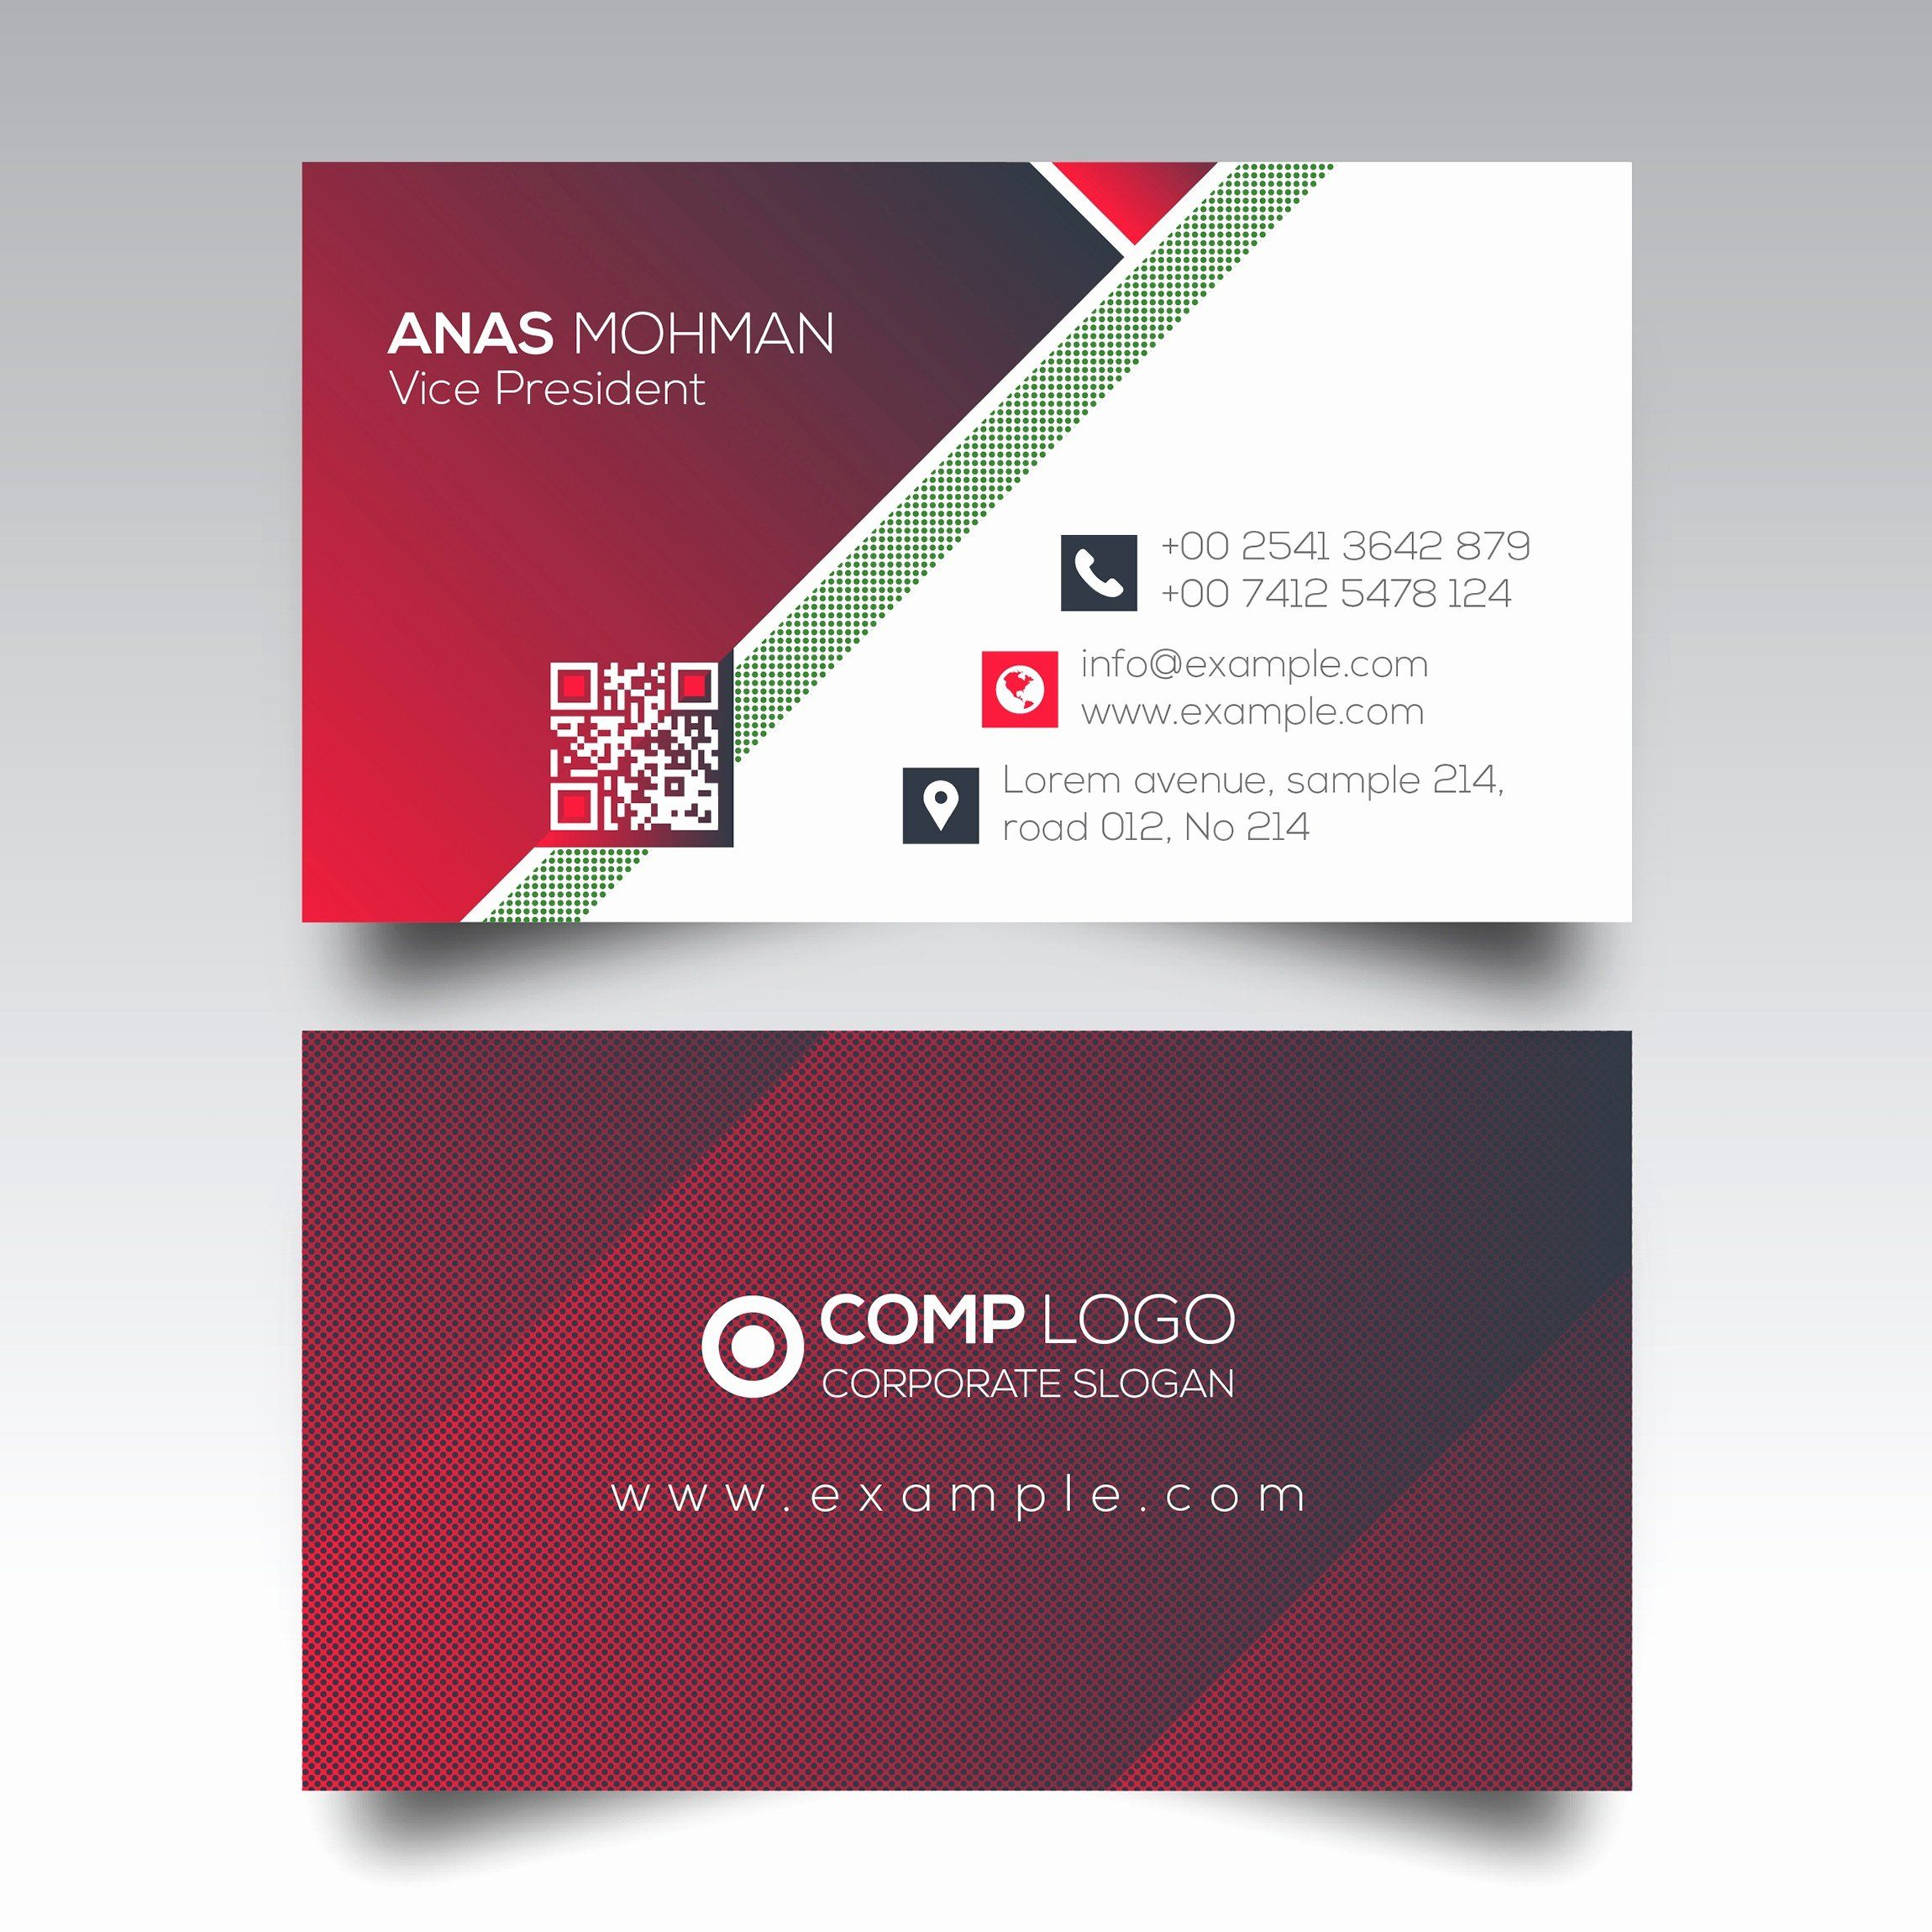 Vistaprint Business Cards Template Psd Luxury Cosmetologist Business Card Templat In 2020 Business Card Template Psd Vistaprint Business Cards Printable Business Cards Vistaprint business card photoshop template